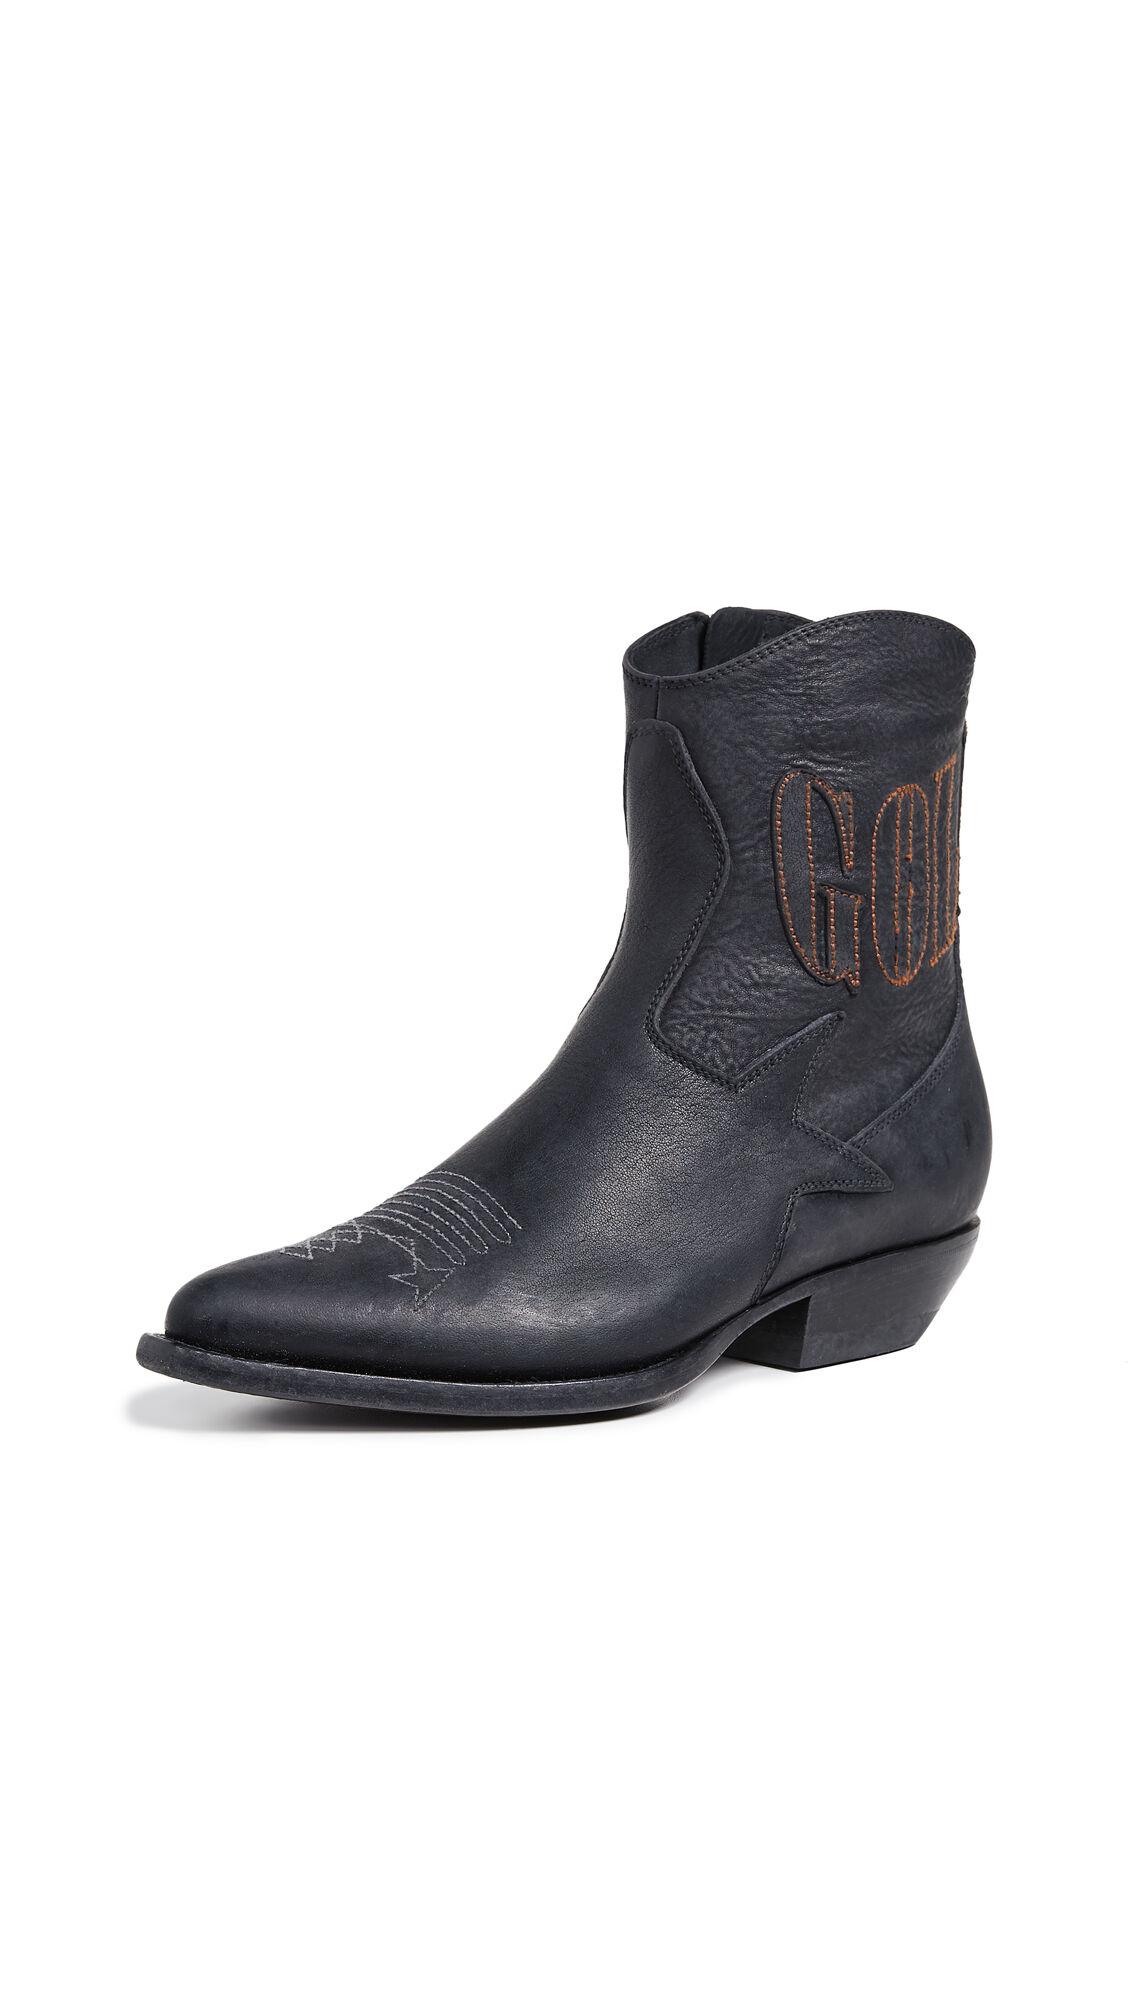 Golden Goose Courtney Boots  - Black Bike - Size: 37